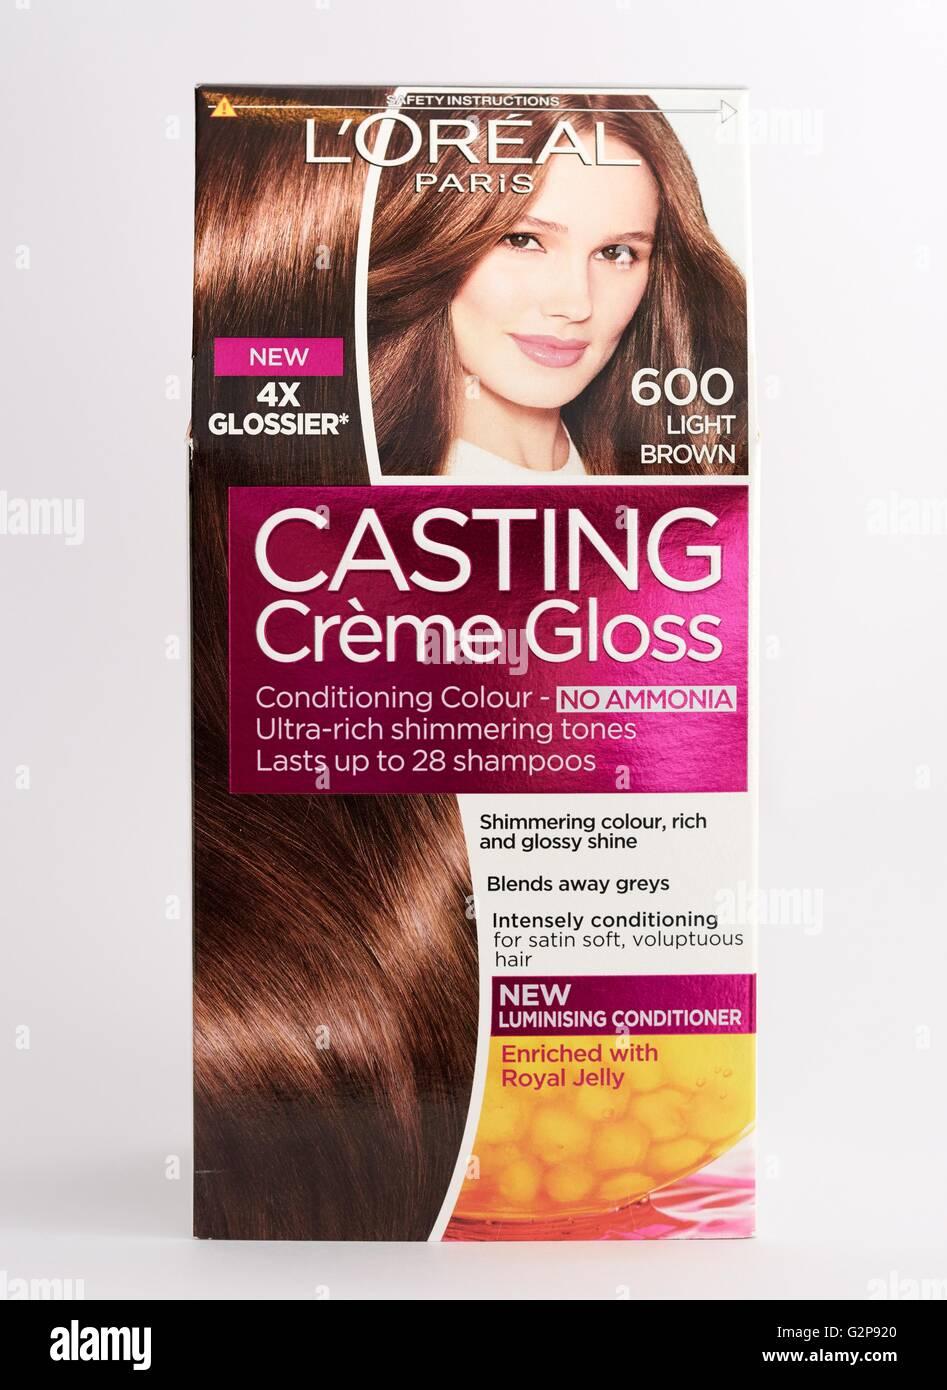 Loreal Hair Dye Casting Creme Stock Photos Loreal Hair Dye Casting